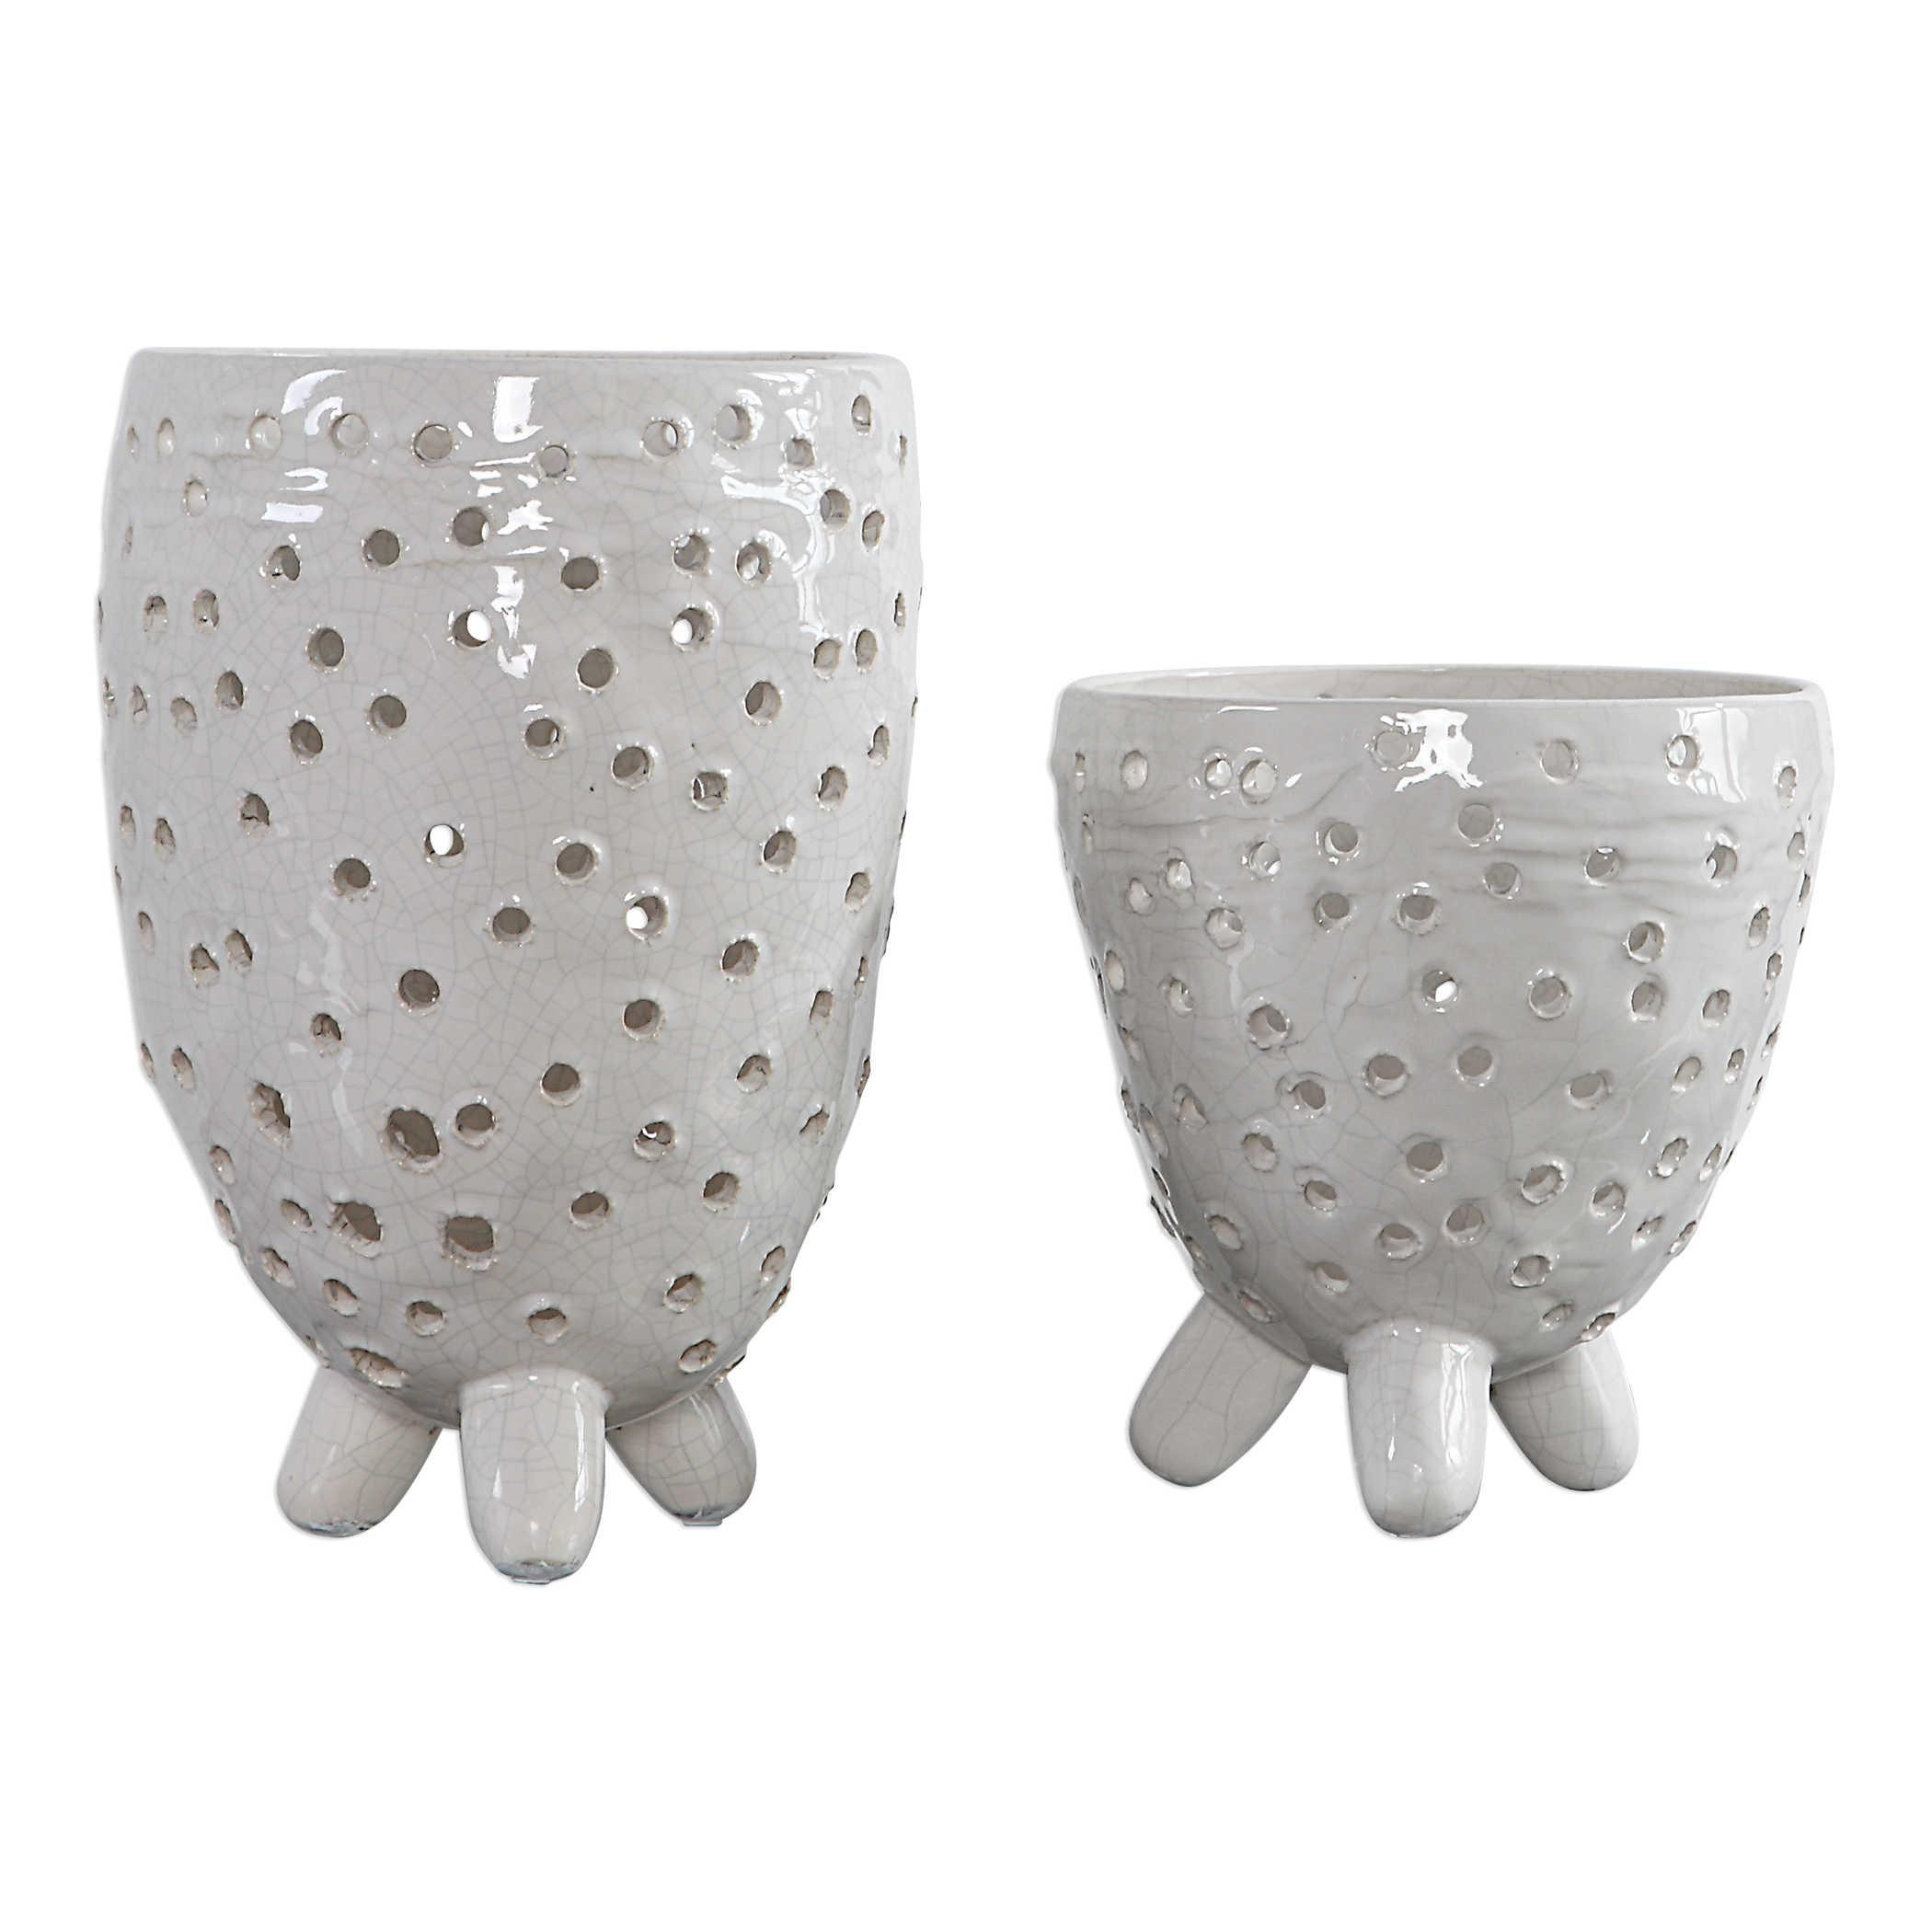 Ivory Pierced Vases